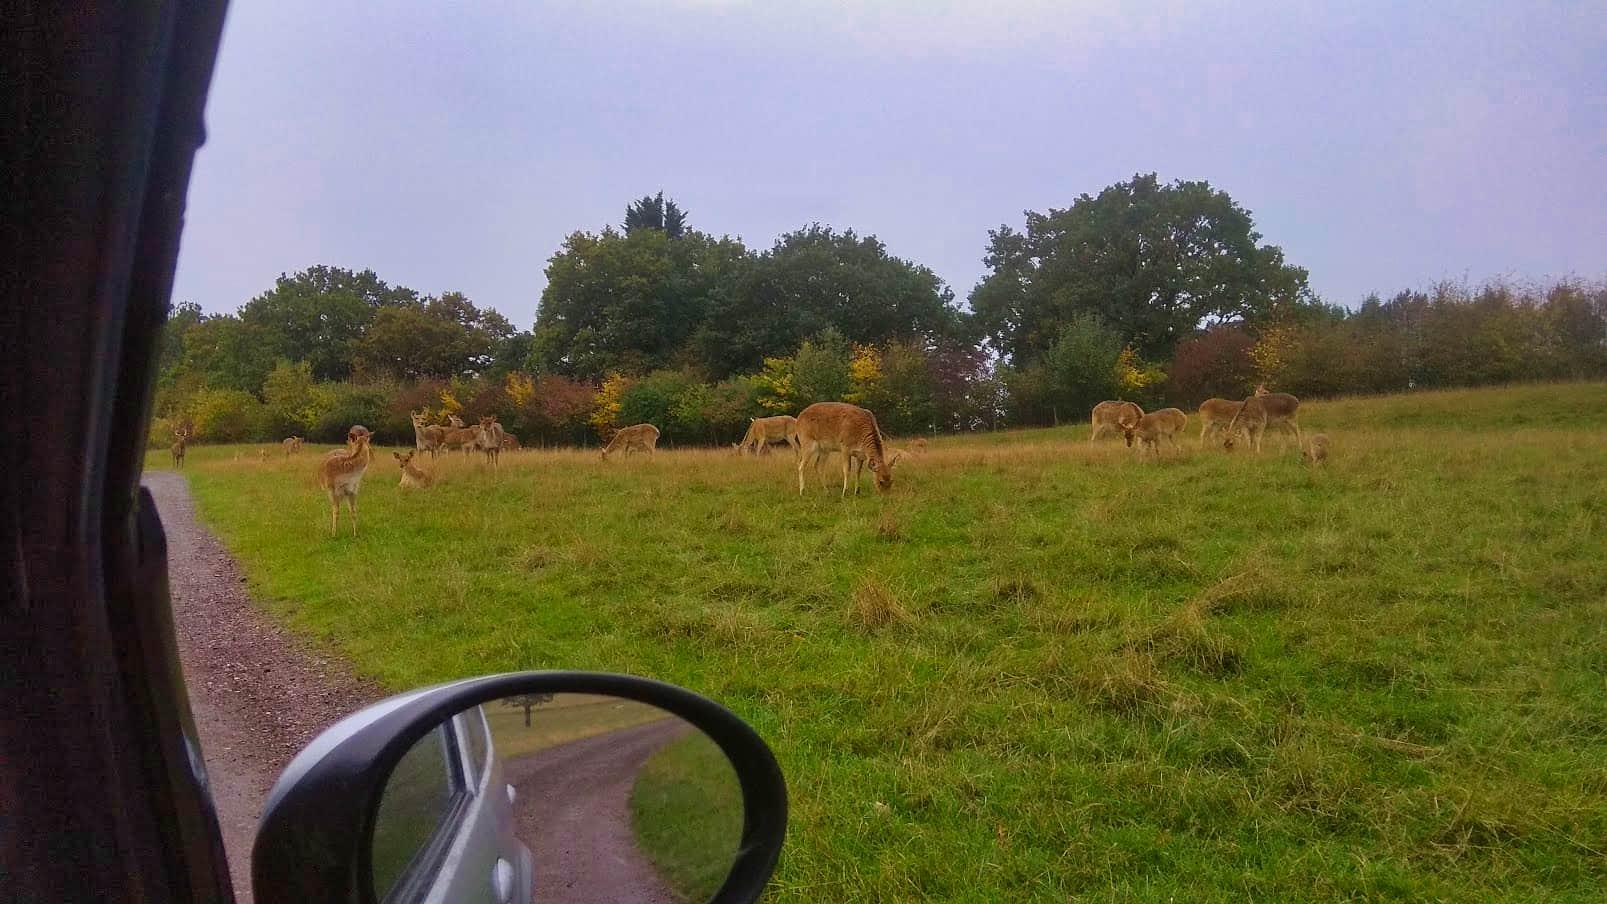 Deer-like animals seen from inside a car